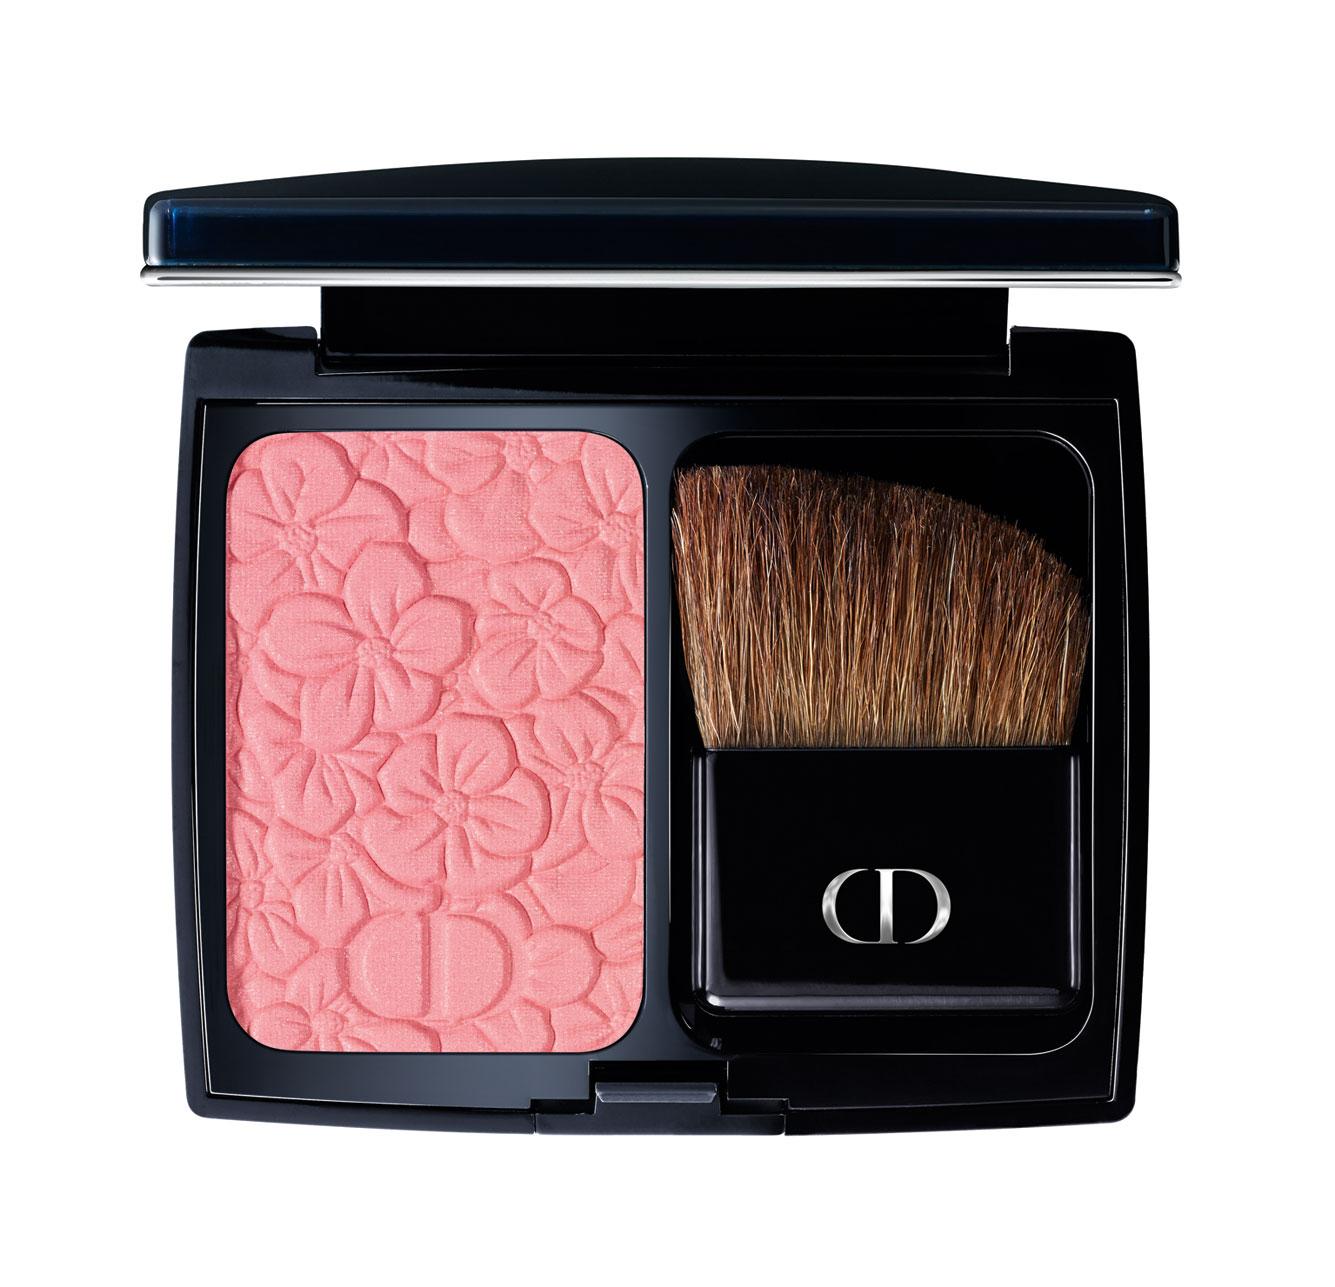 Dior Glowing Gardens. Blush Floral Pink.